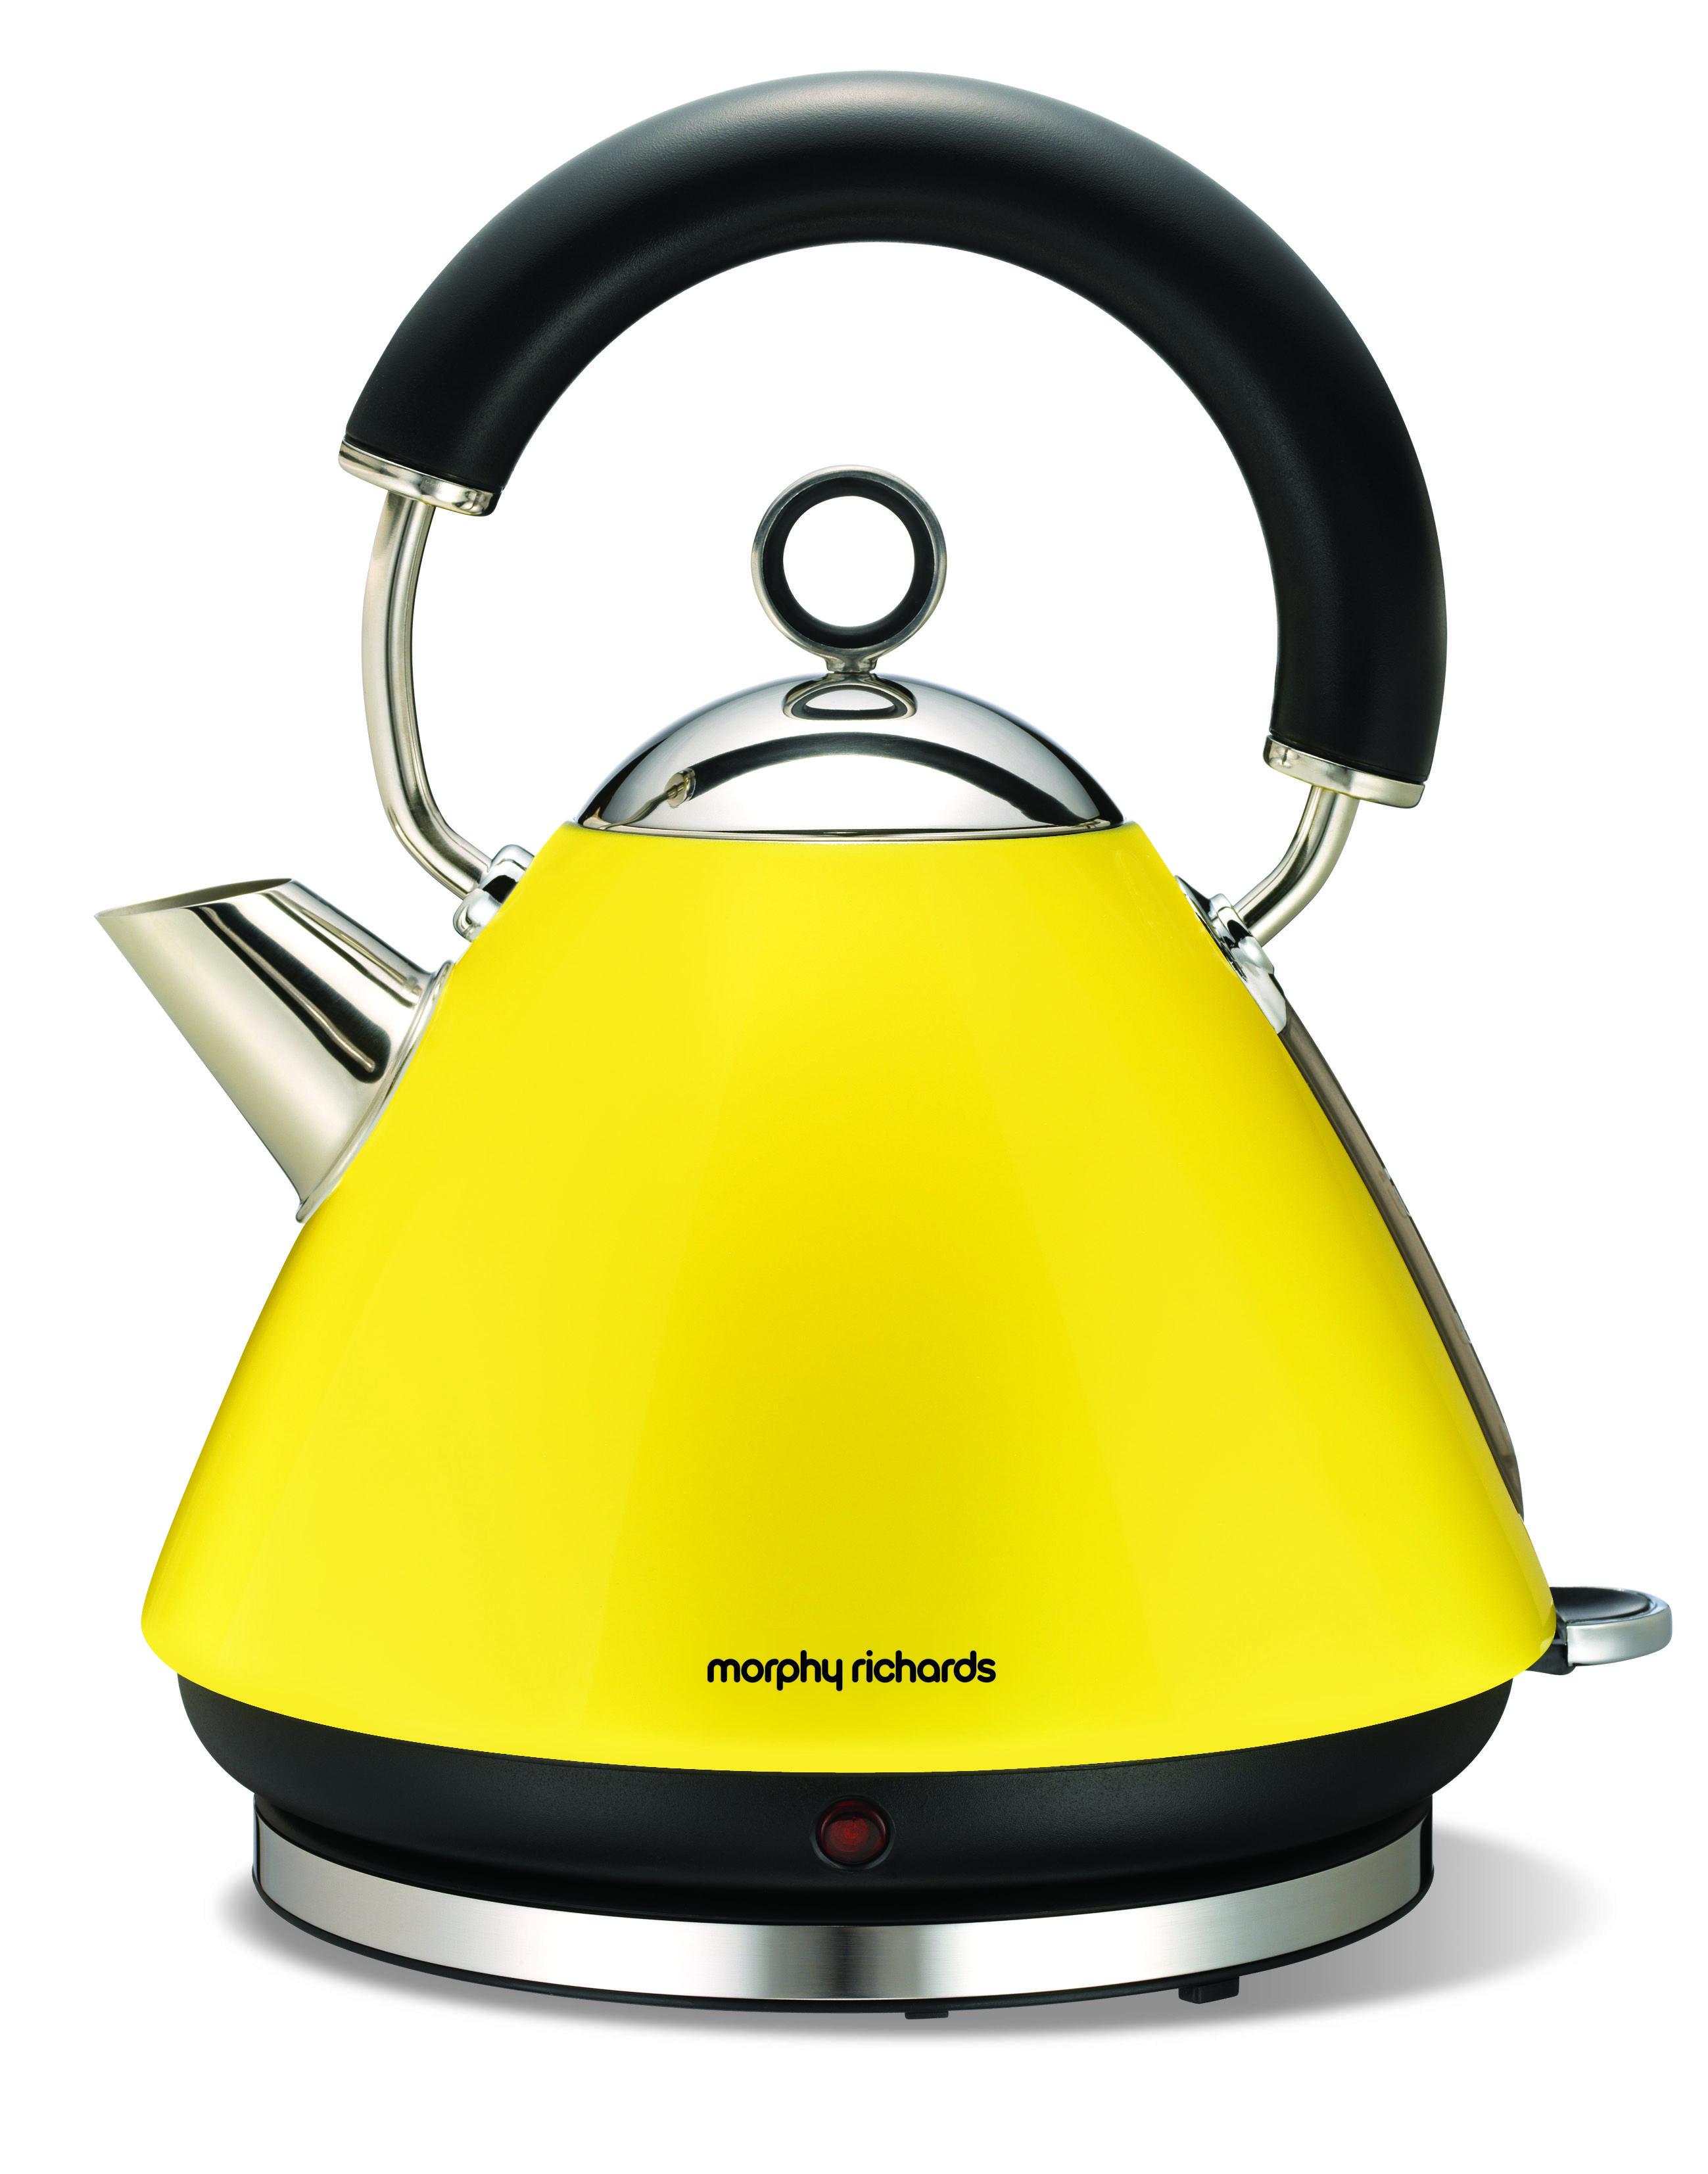 Morphy Richards Lemon Yellow Kettle Yellow Traditional Kettles Kettle Yellow Toaster